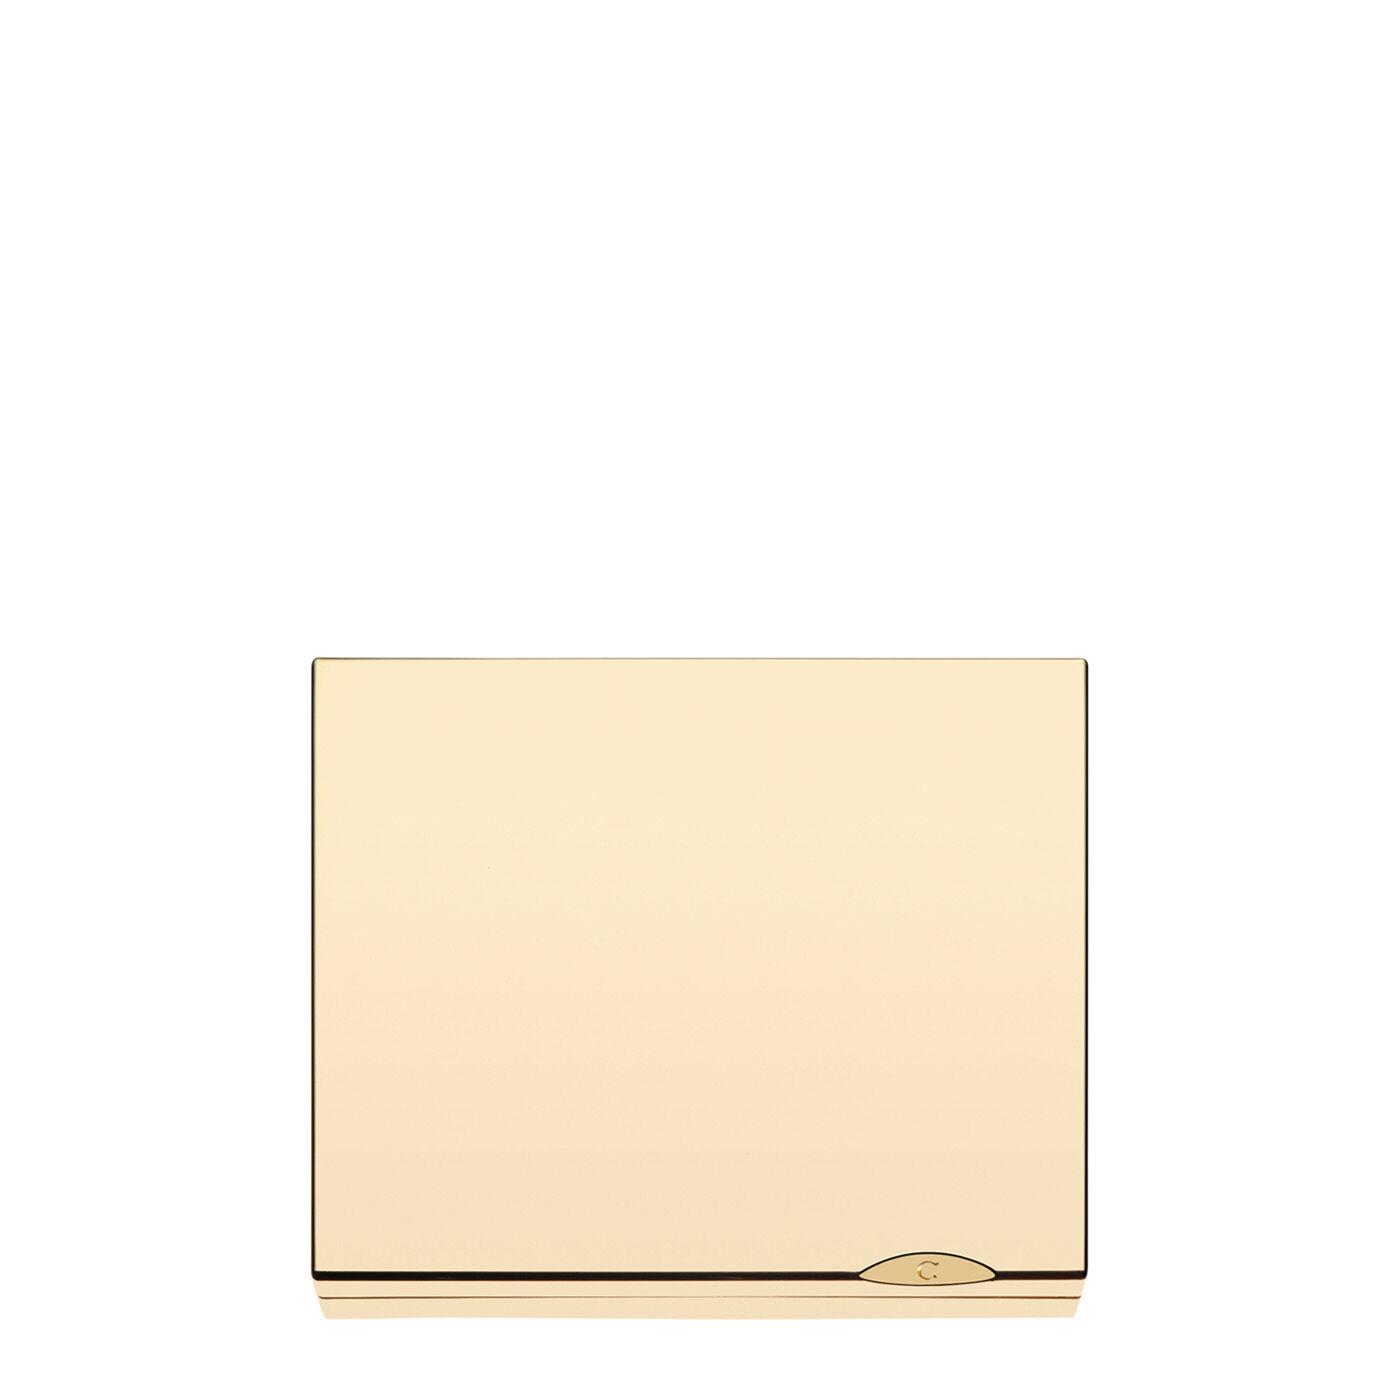 Mineralischer Kompakt-Puder Ever Matte mit Matt-Effekt 02 Transparent medium